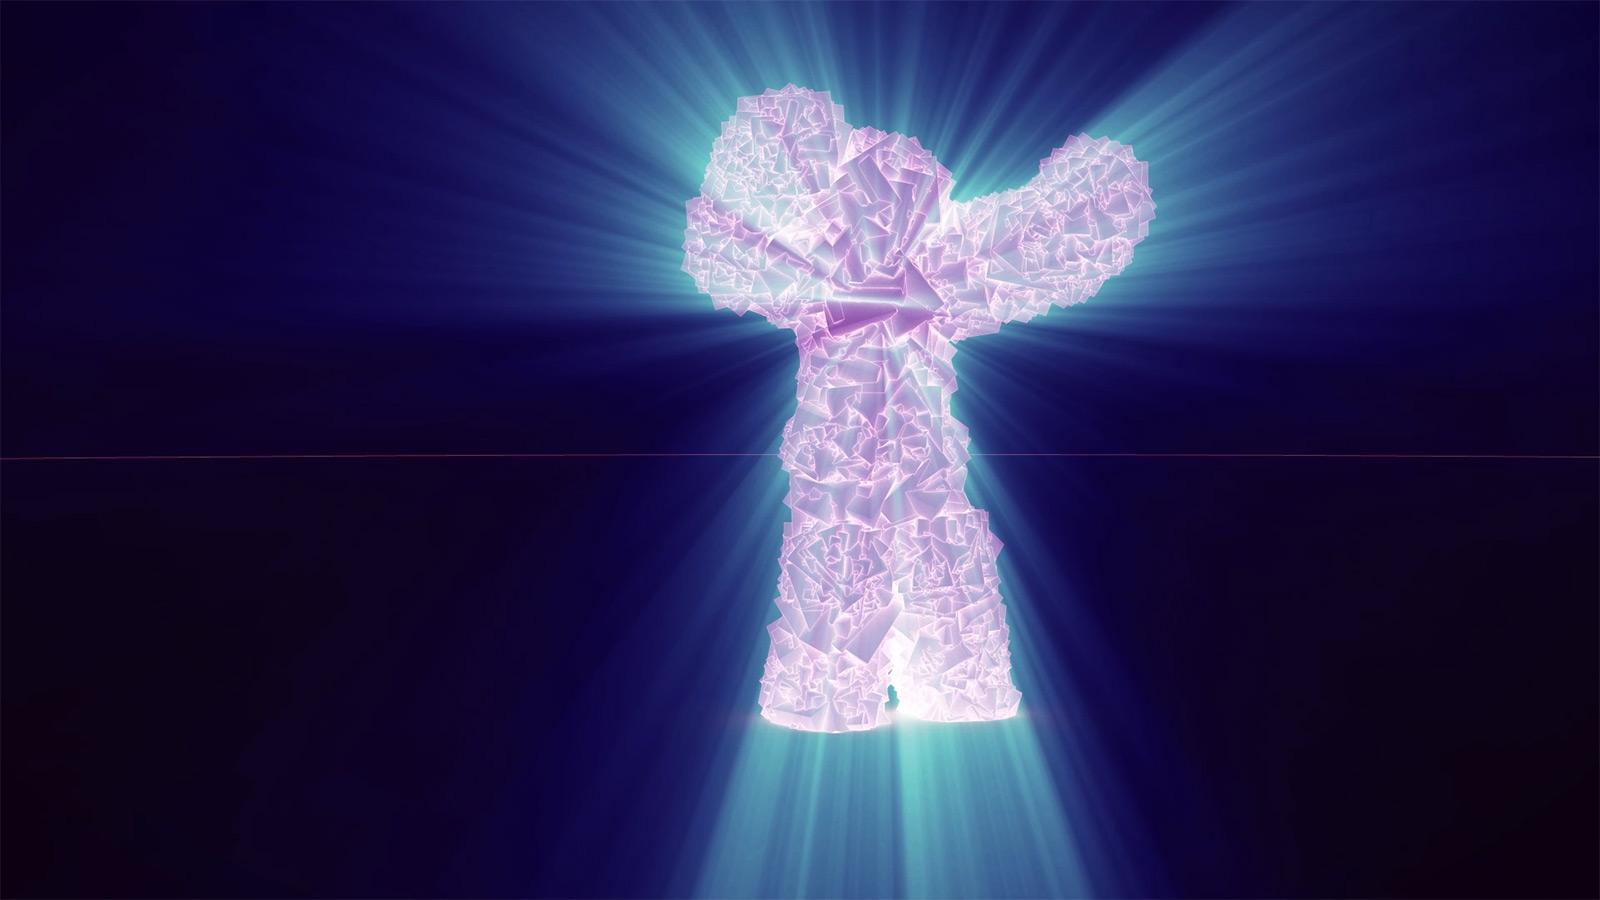 Blog: Virtual Dancer Animation